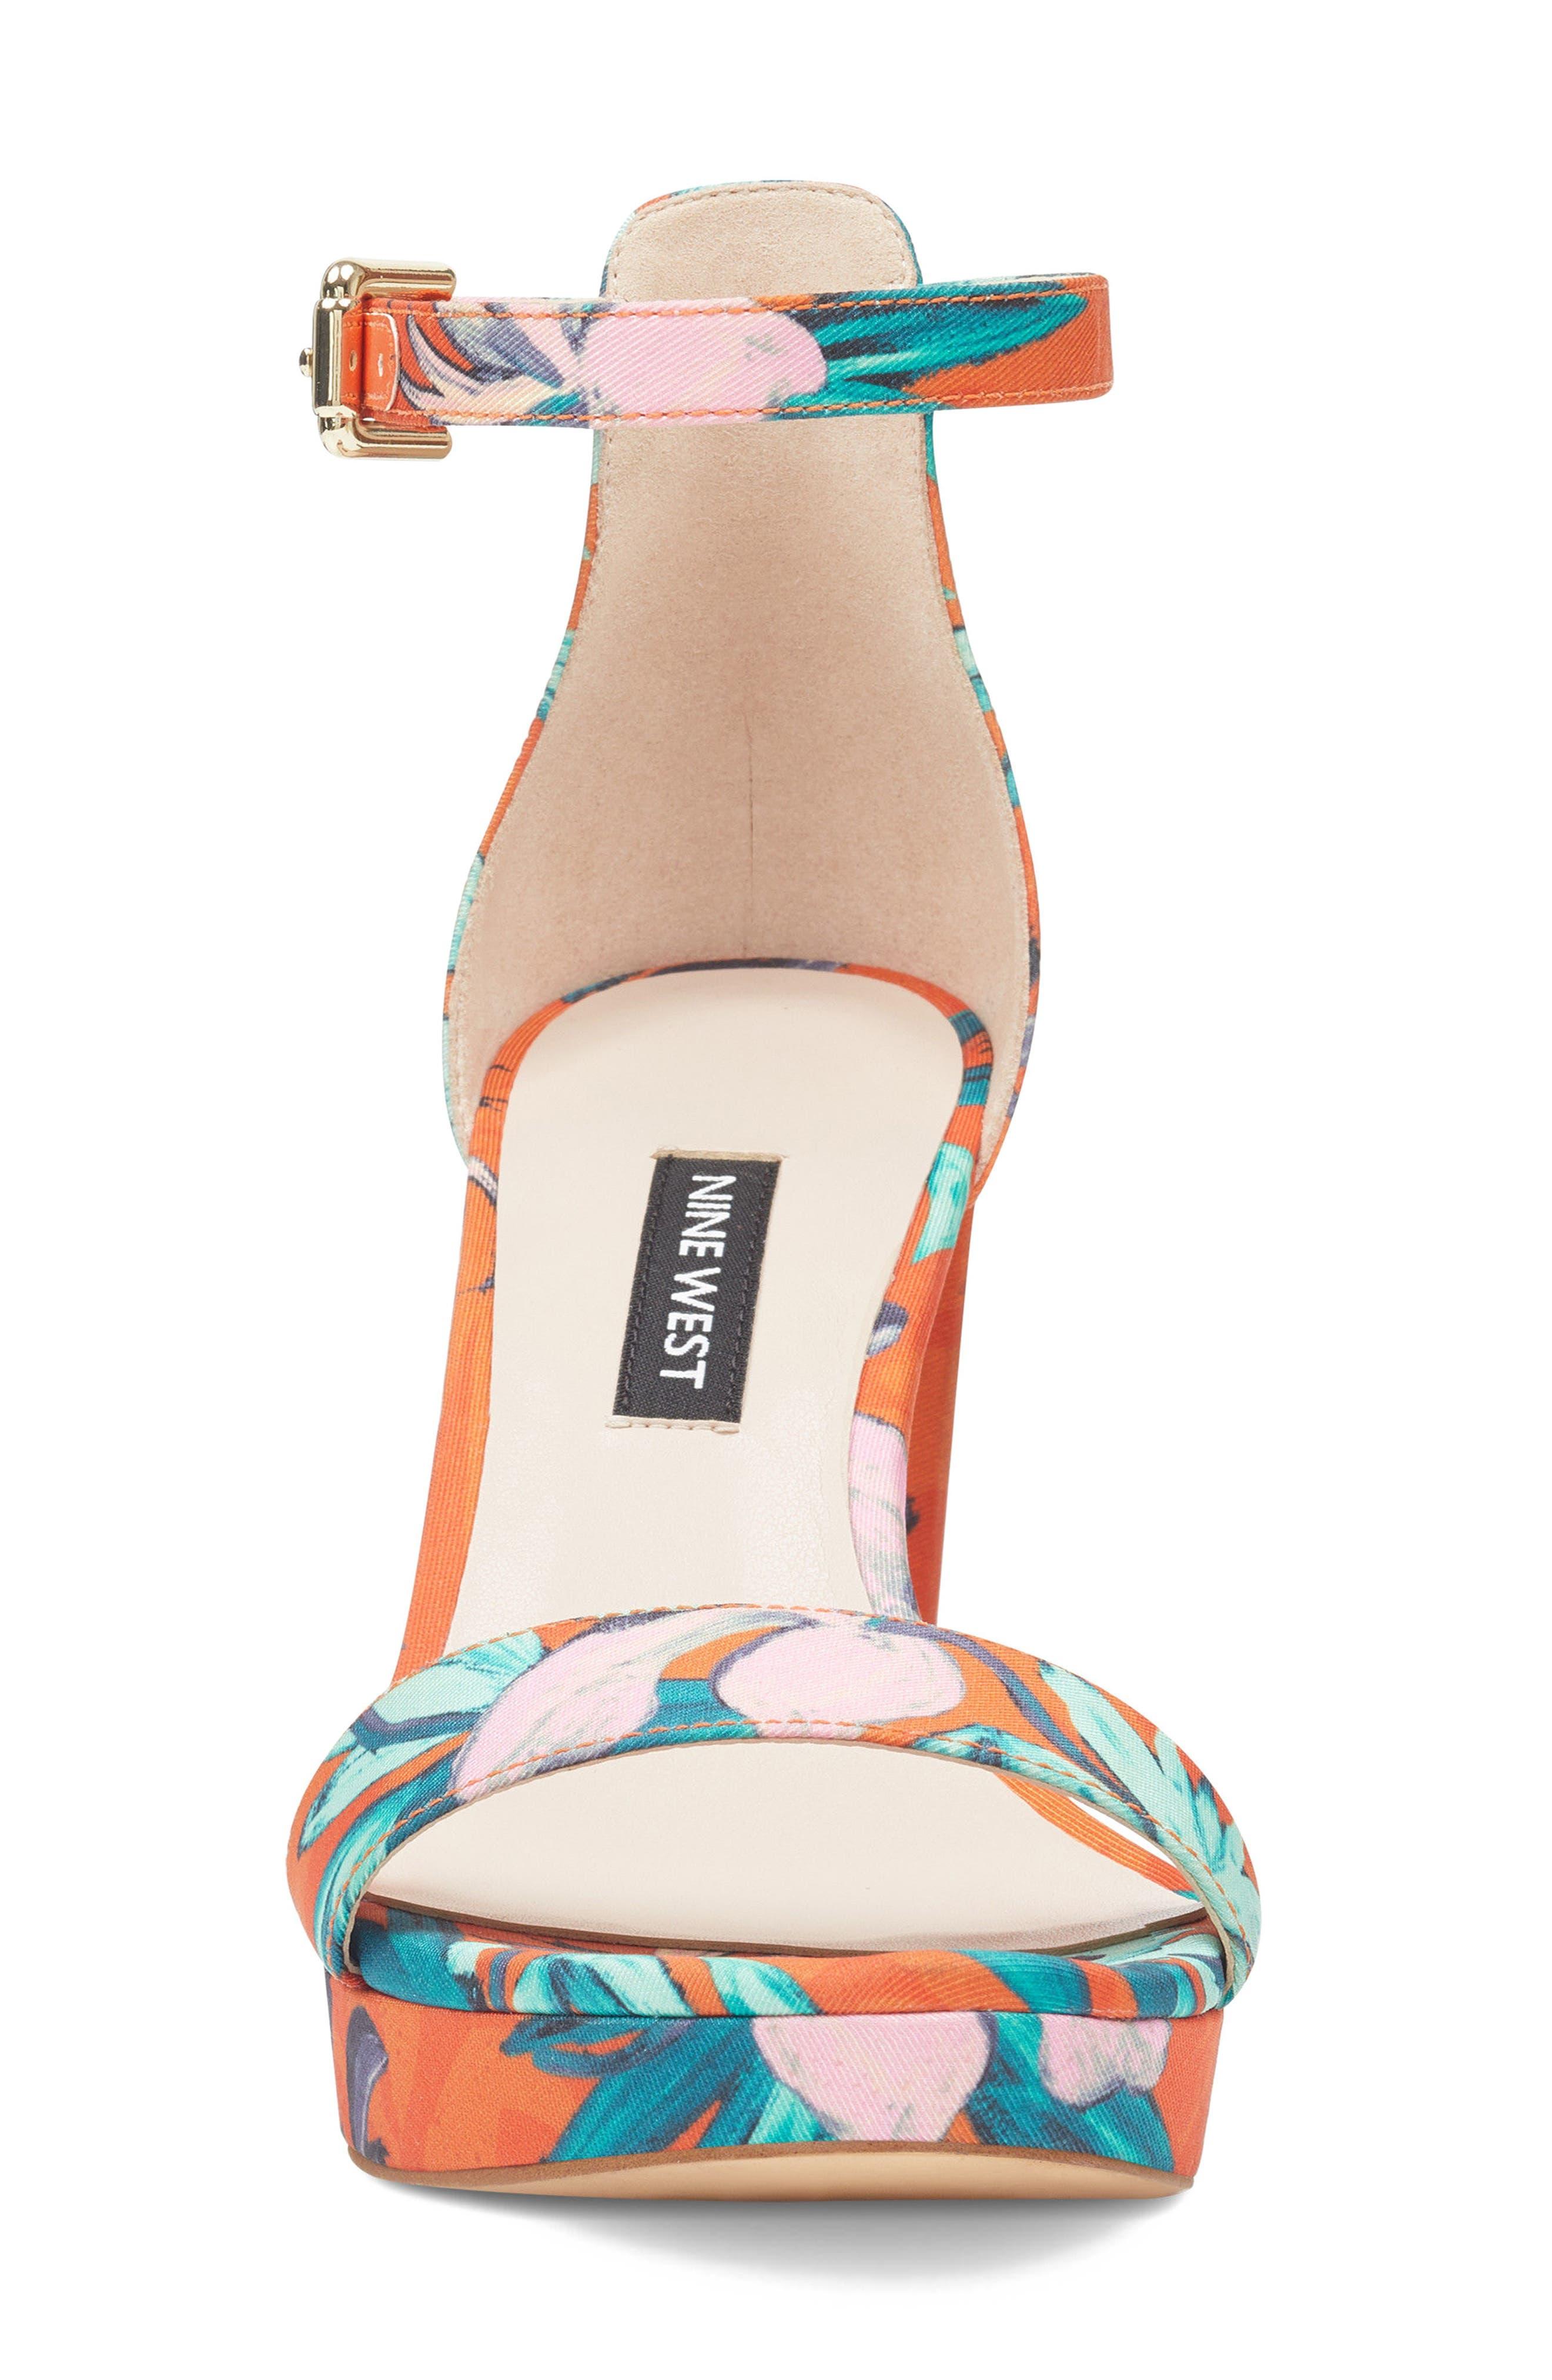 Dempsey Platform Sandal,                             Alternate thumbnail 4, color,                             ORANGE MULTI FABRIC